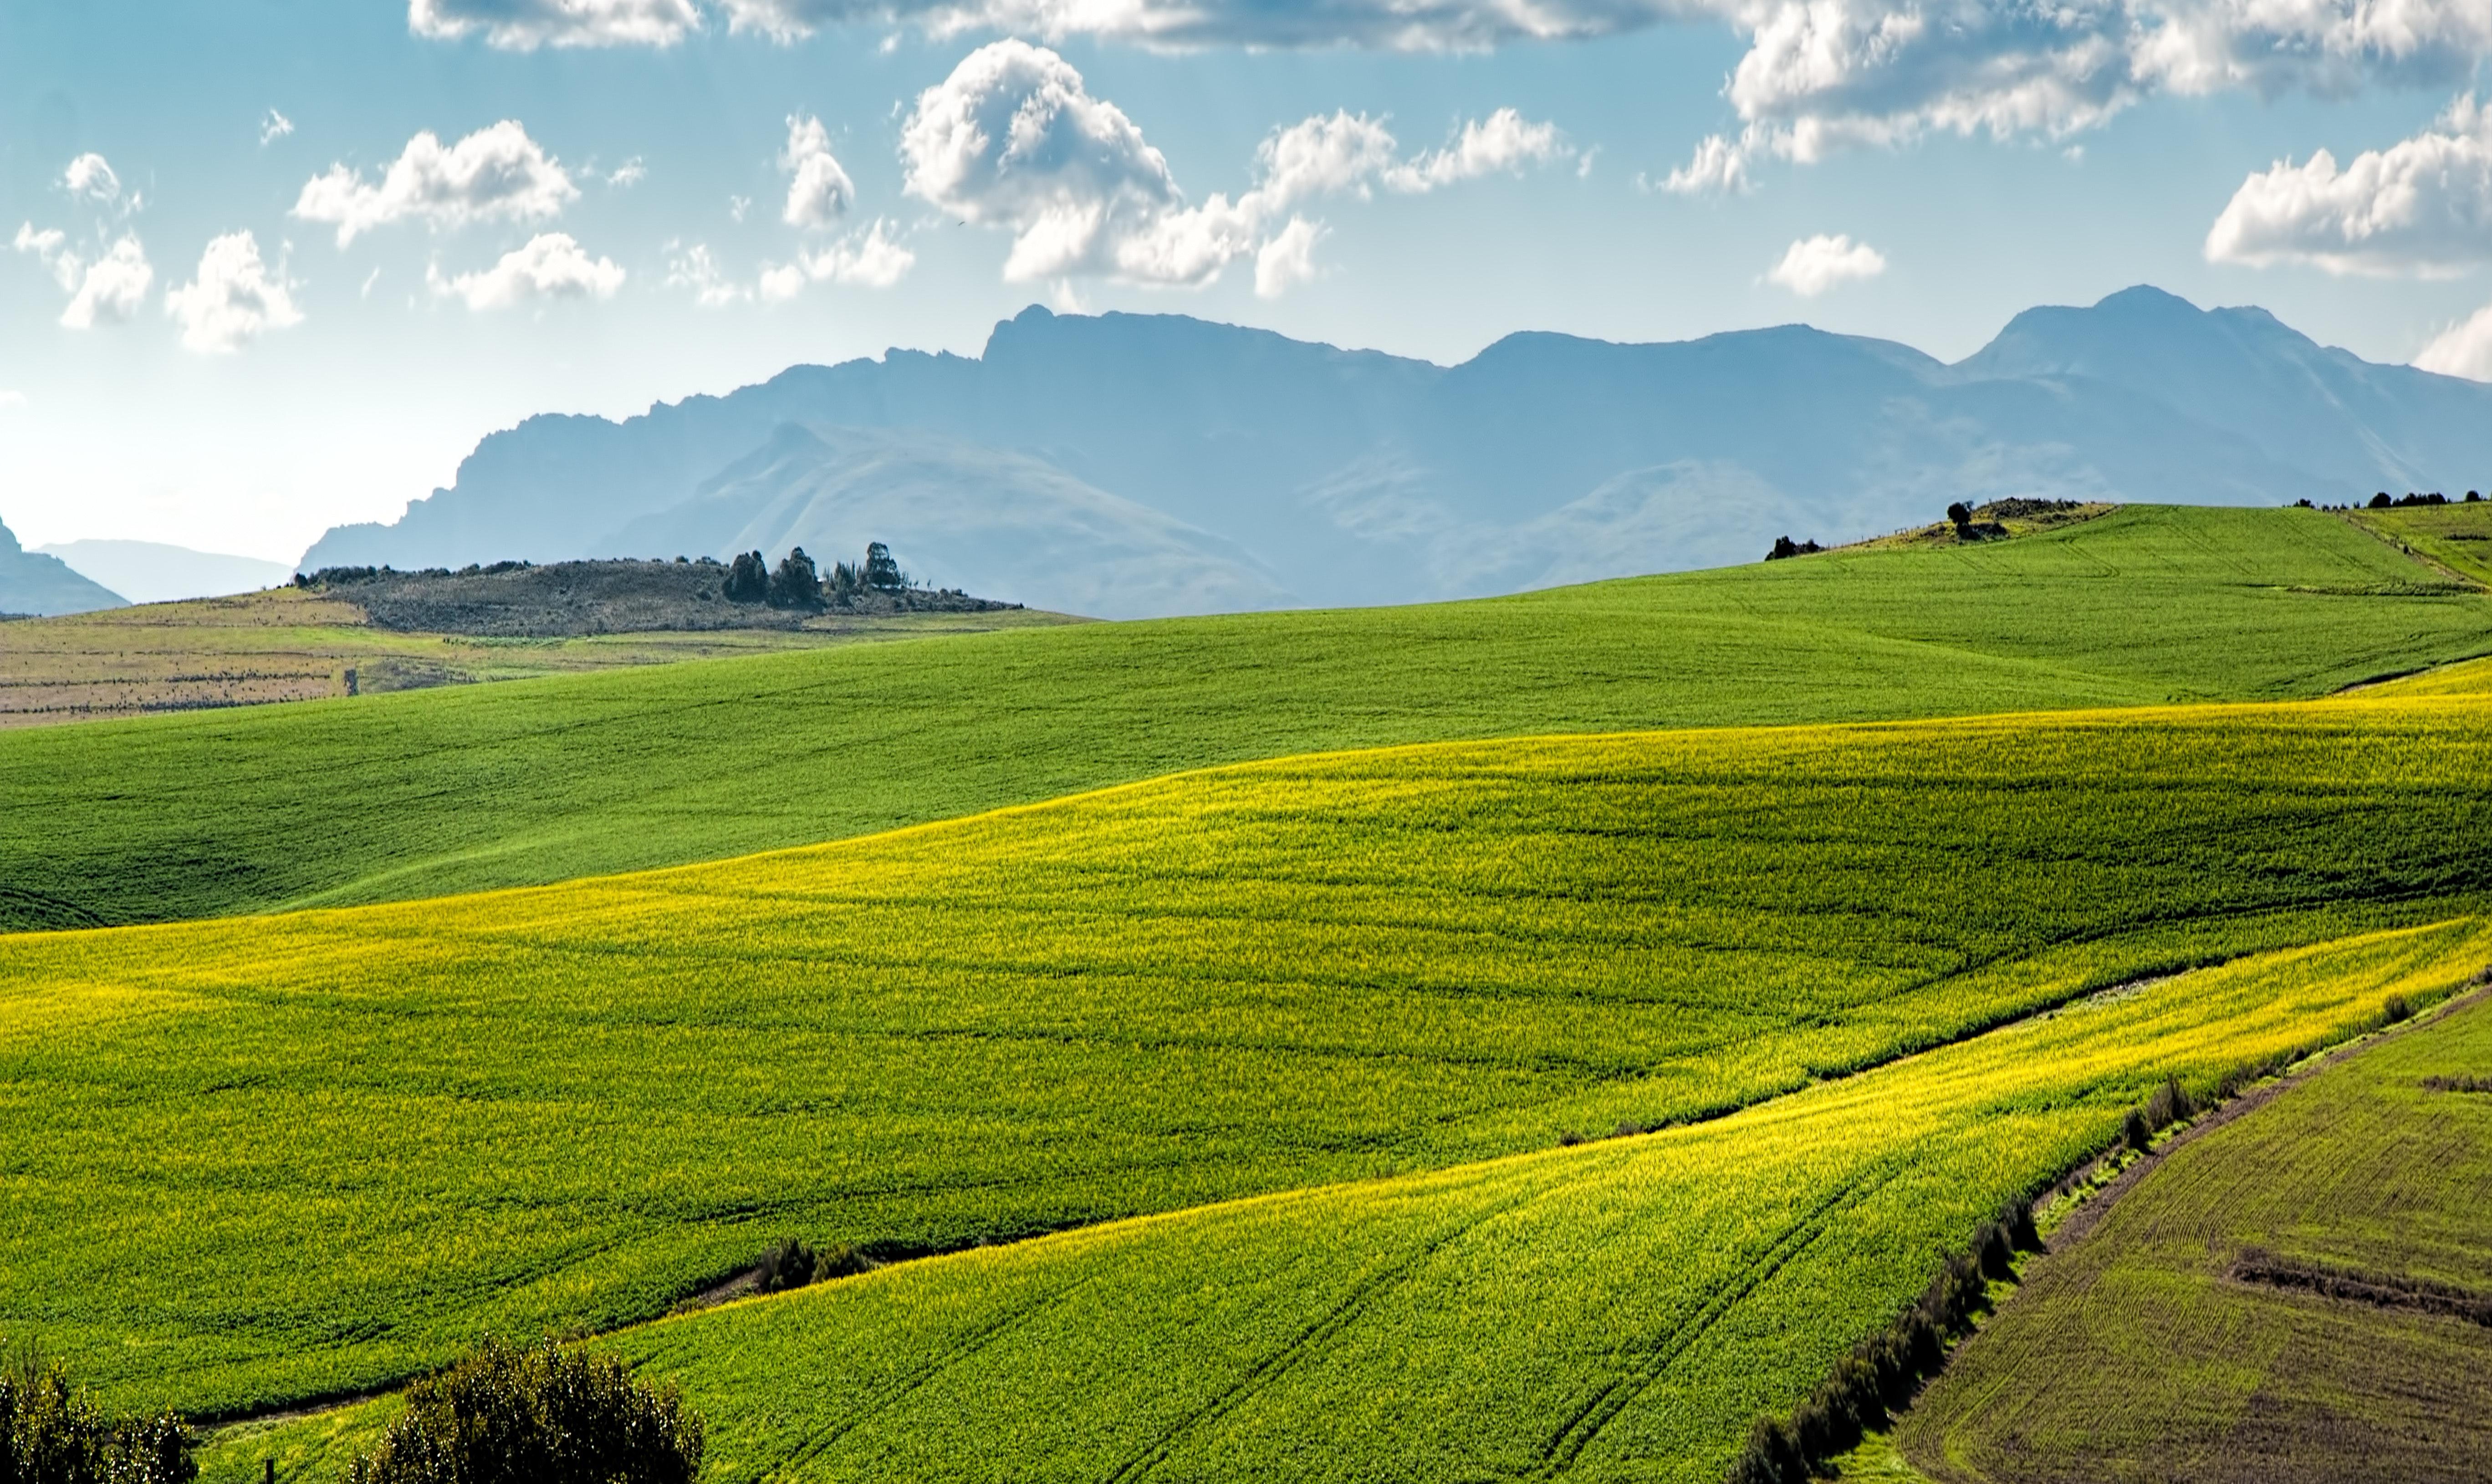 crop-cropland-environment-259280